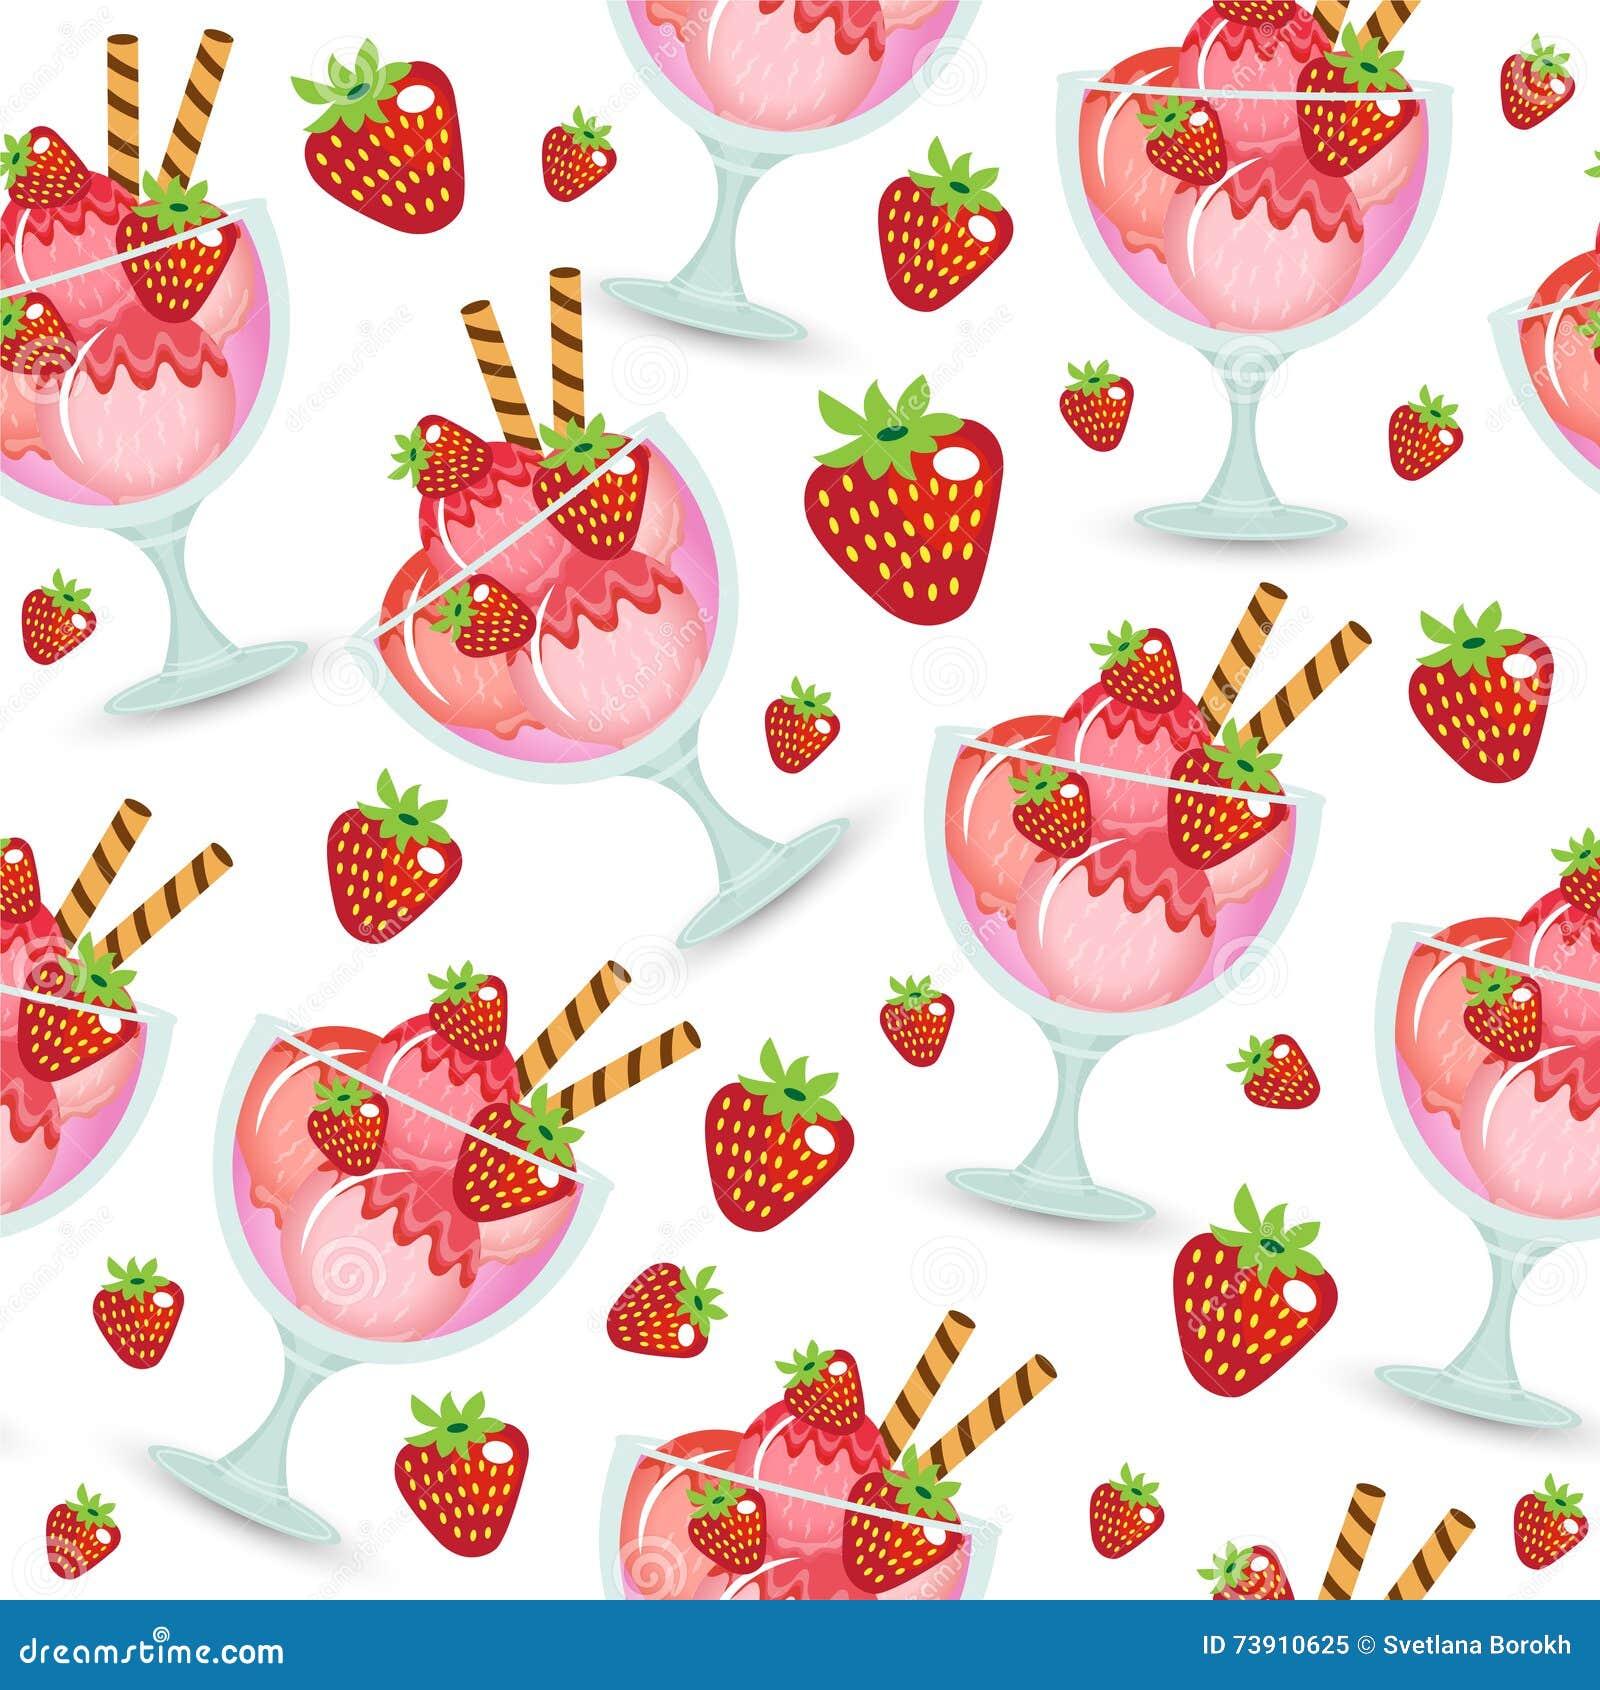 Dessert Yummy Ice Cream Wallpapers: Seamless Texture Of Ice Cream Dessert In A Glass Cup. Milk